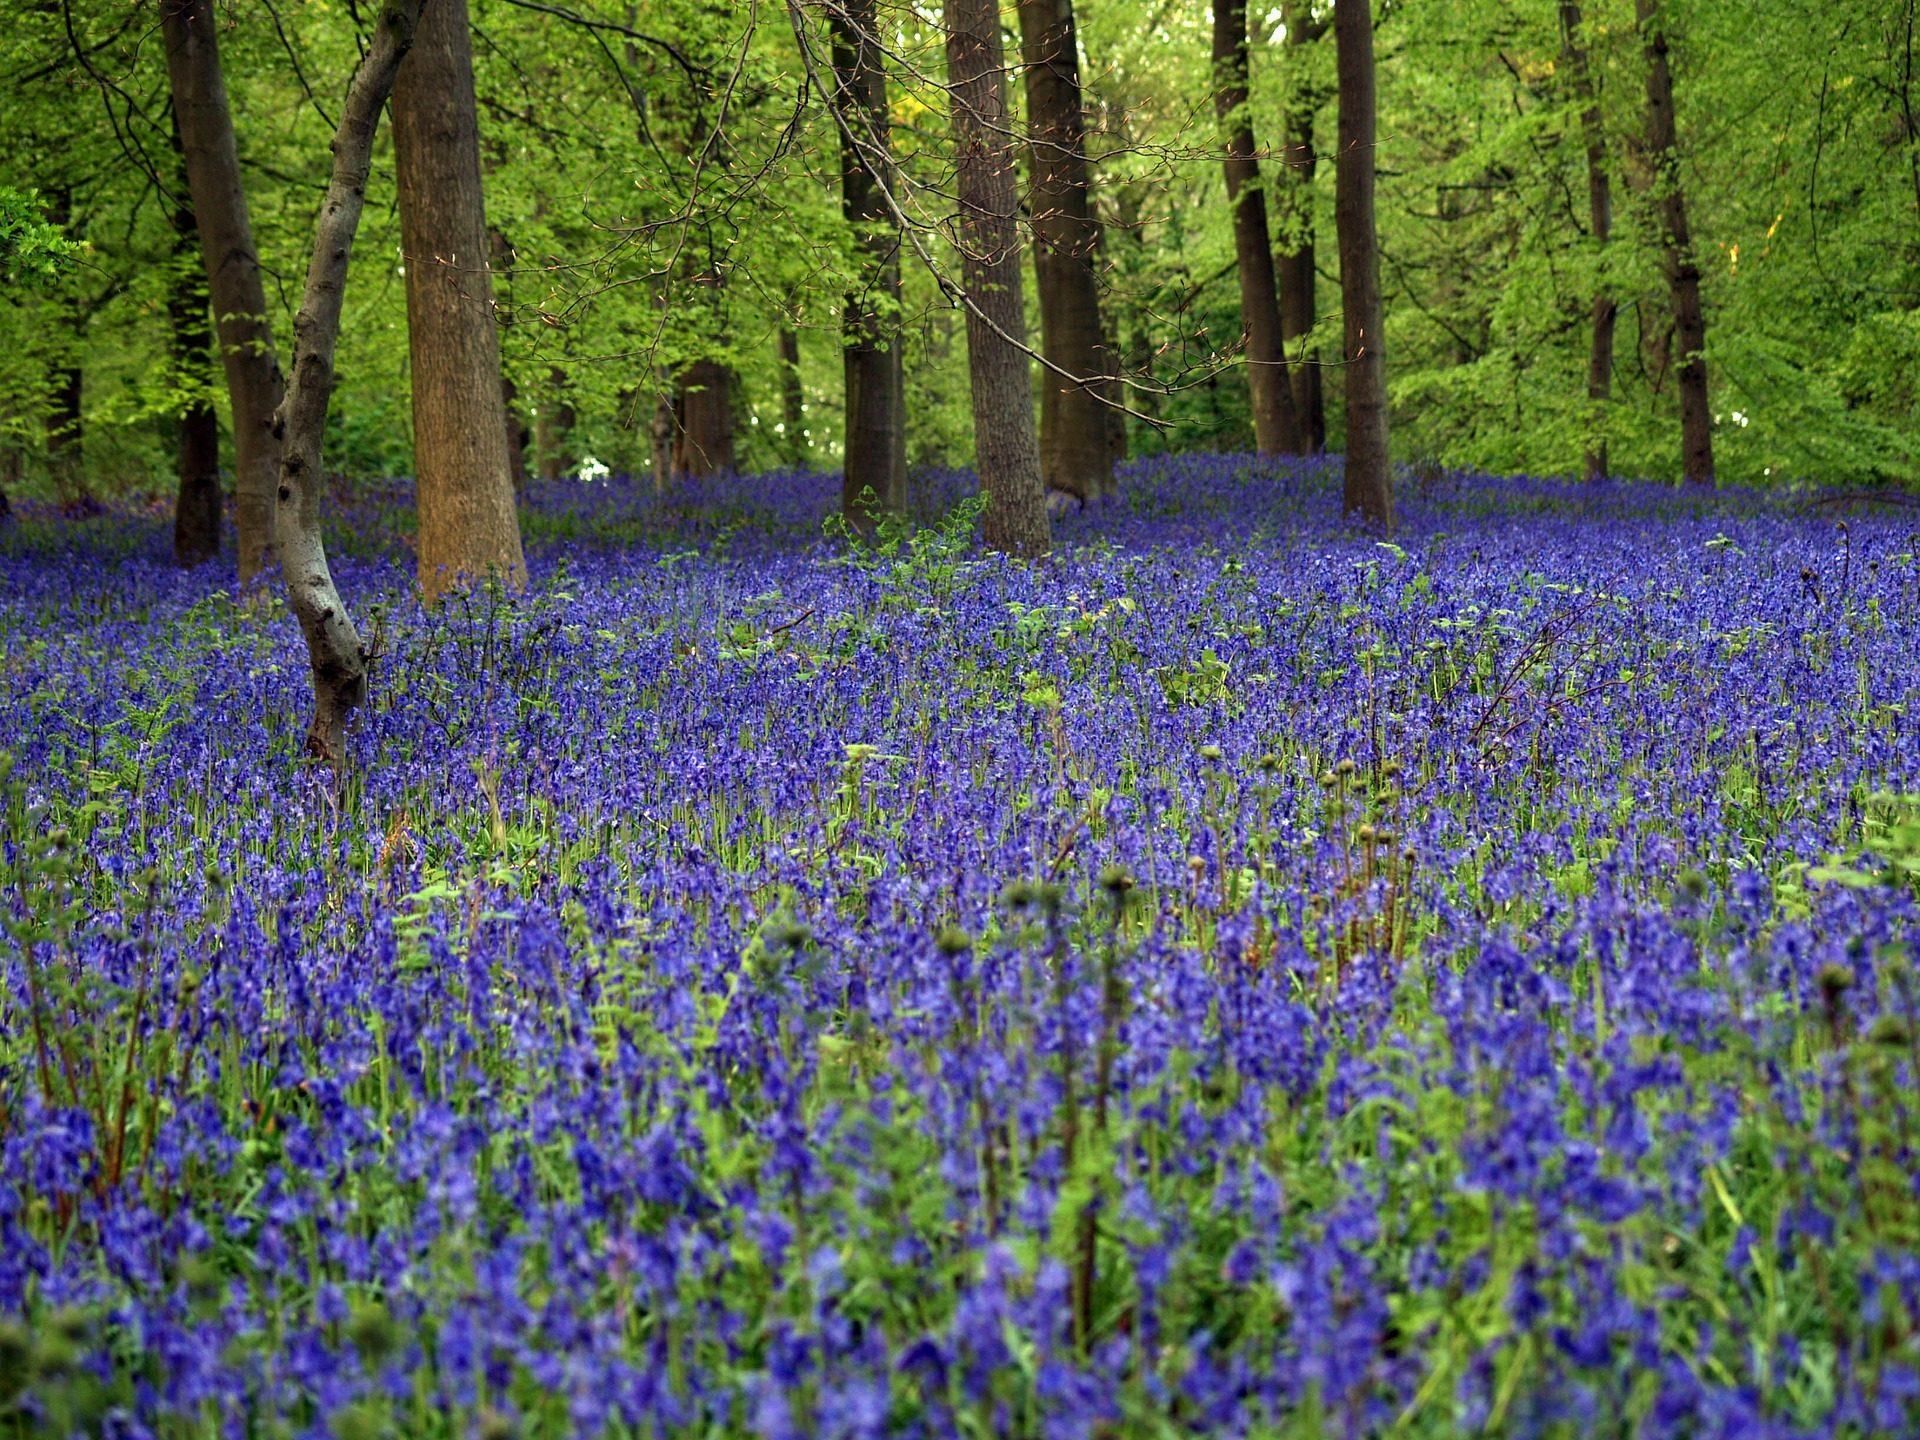 campo, bosque, árboles, campanillas, azules, plantas - Fondos de Pantalla HD - professor-falken.com